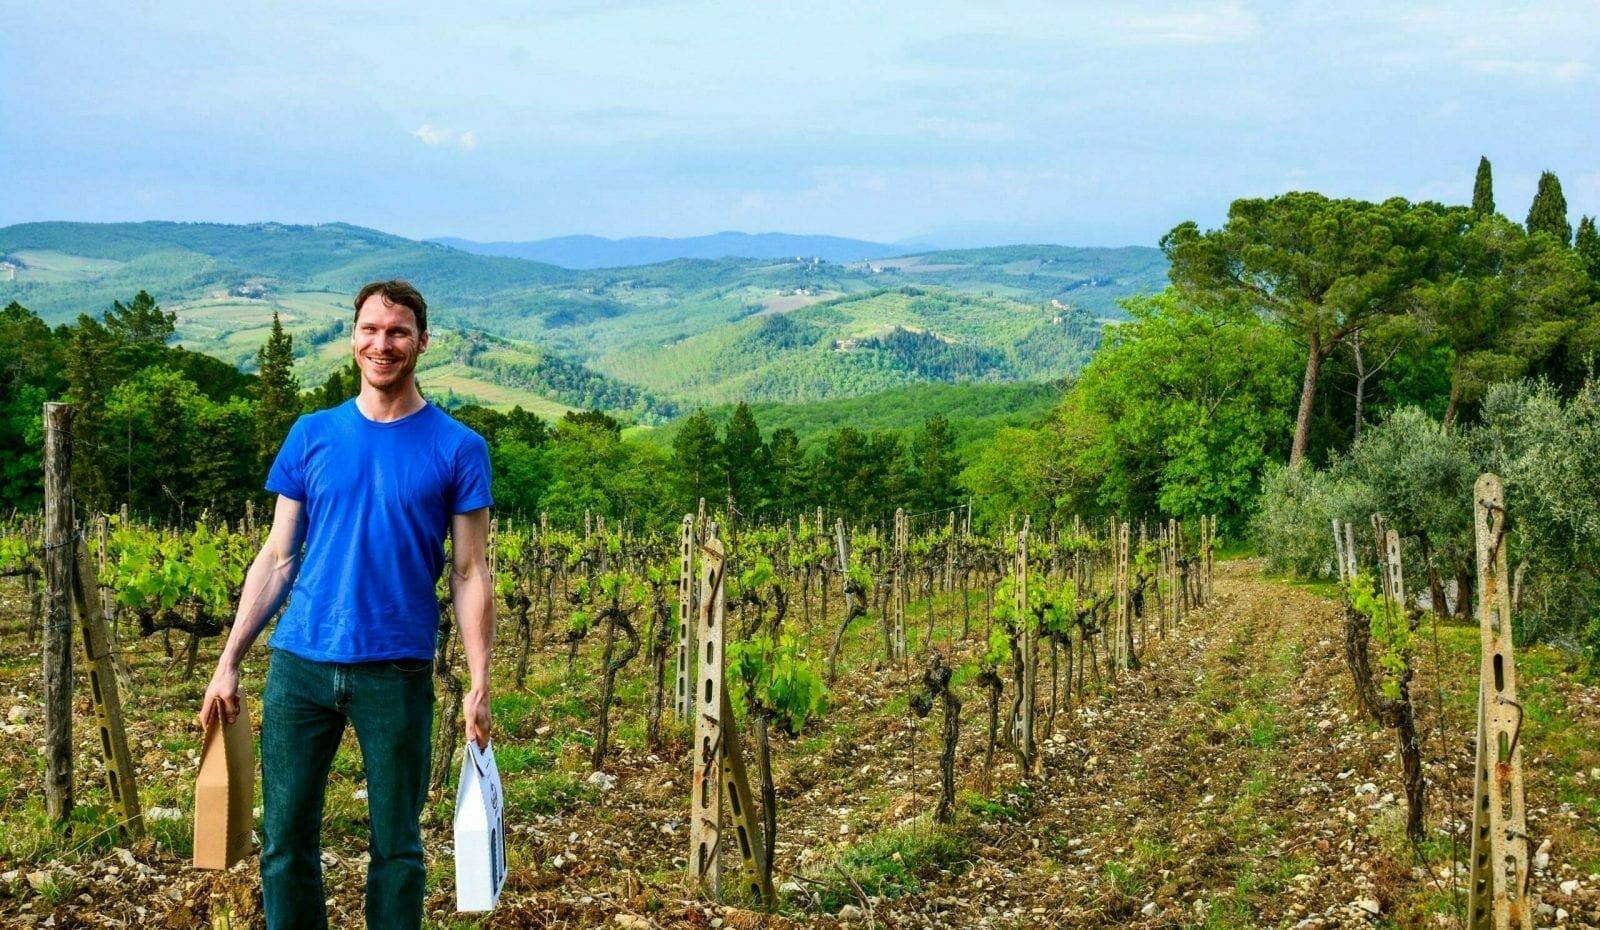 Ryan in Tuscany Winery